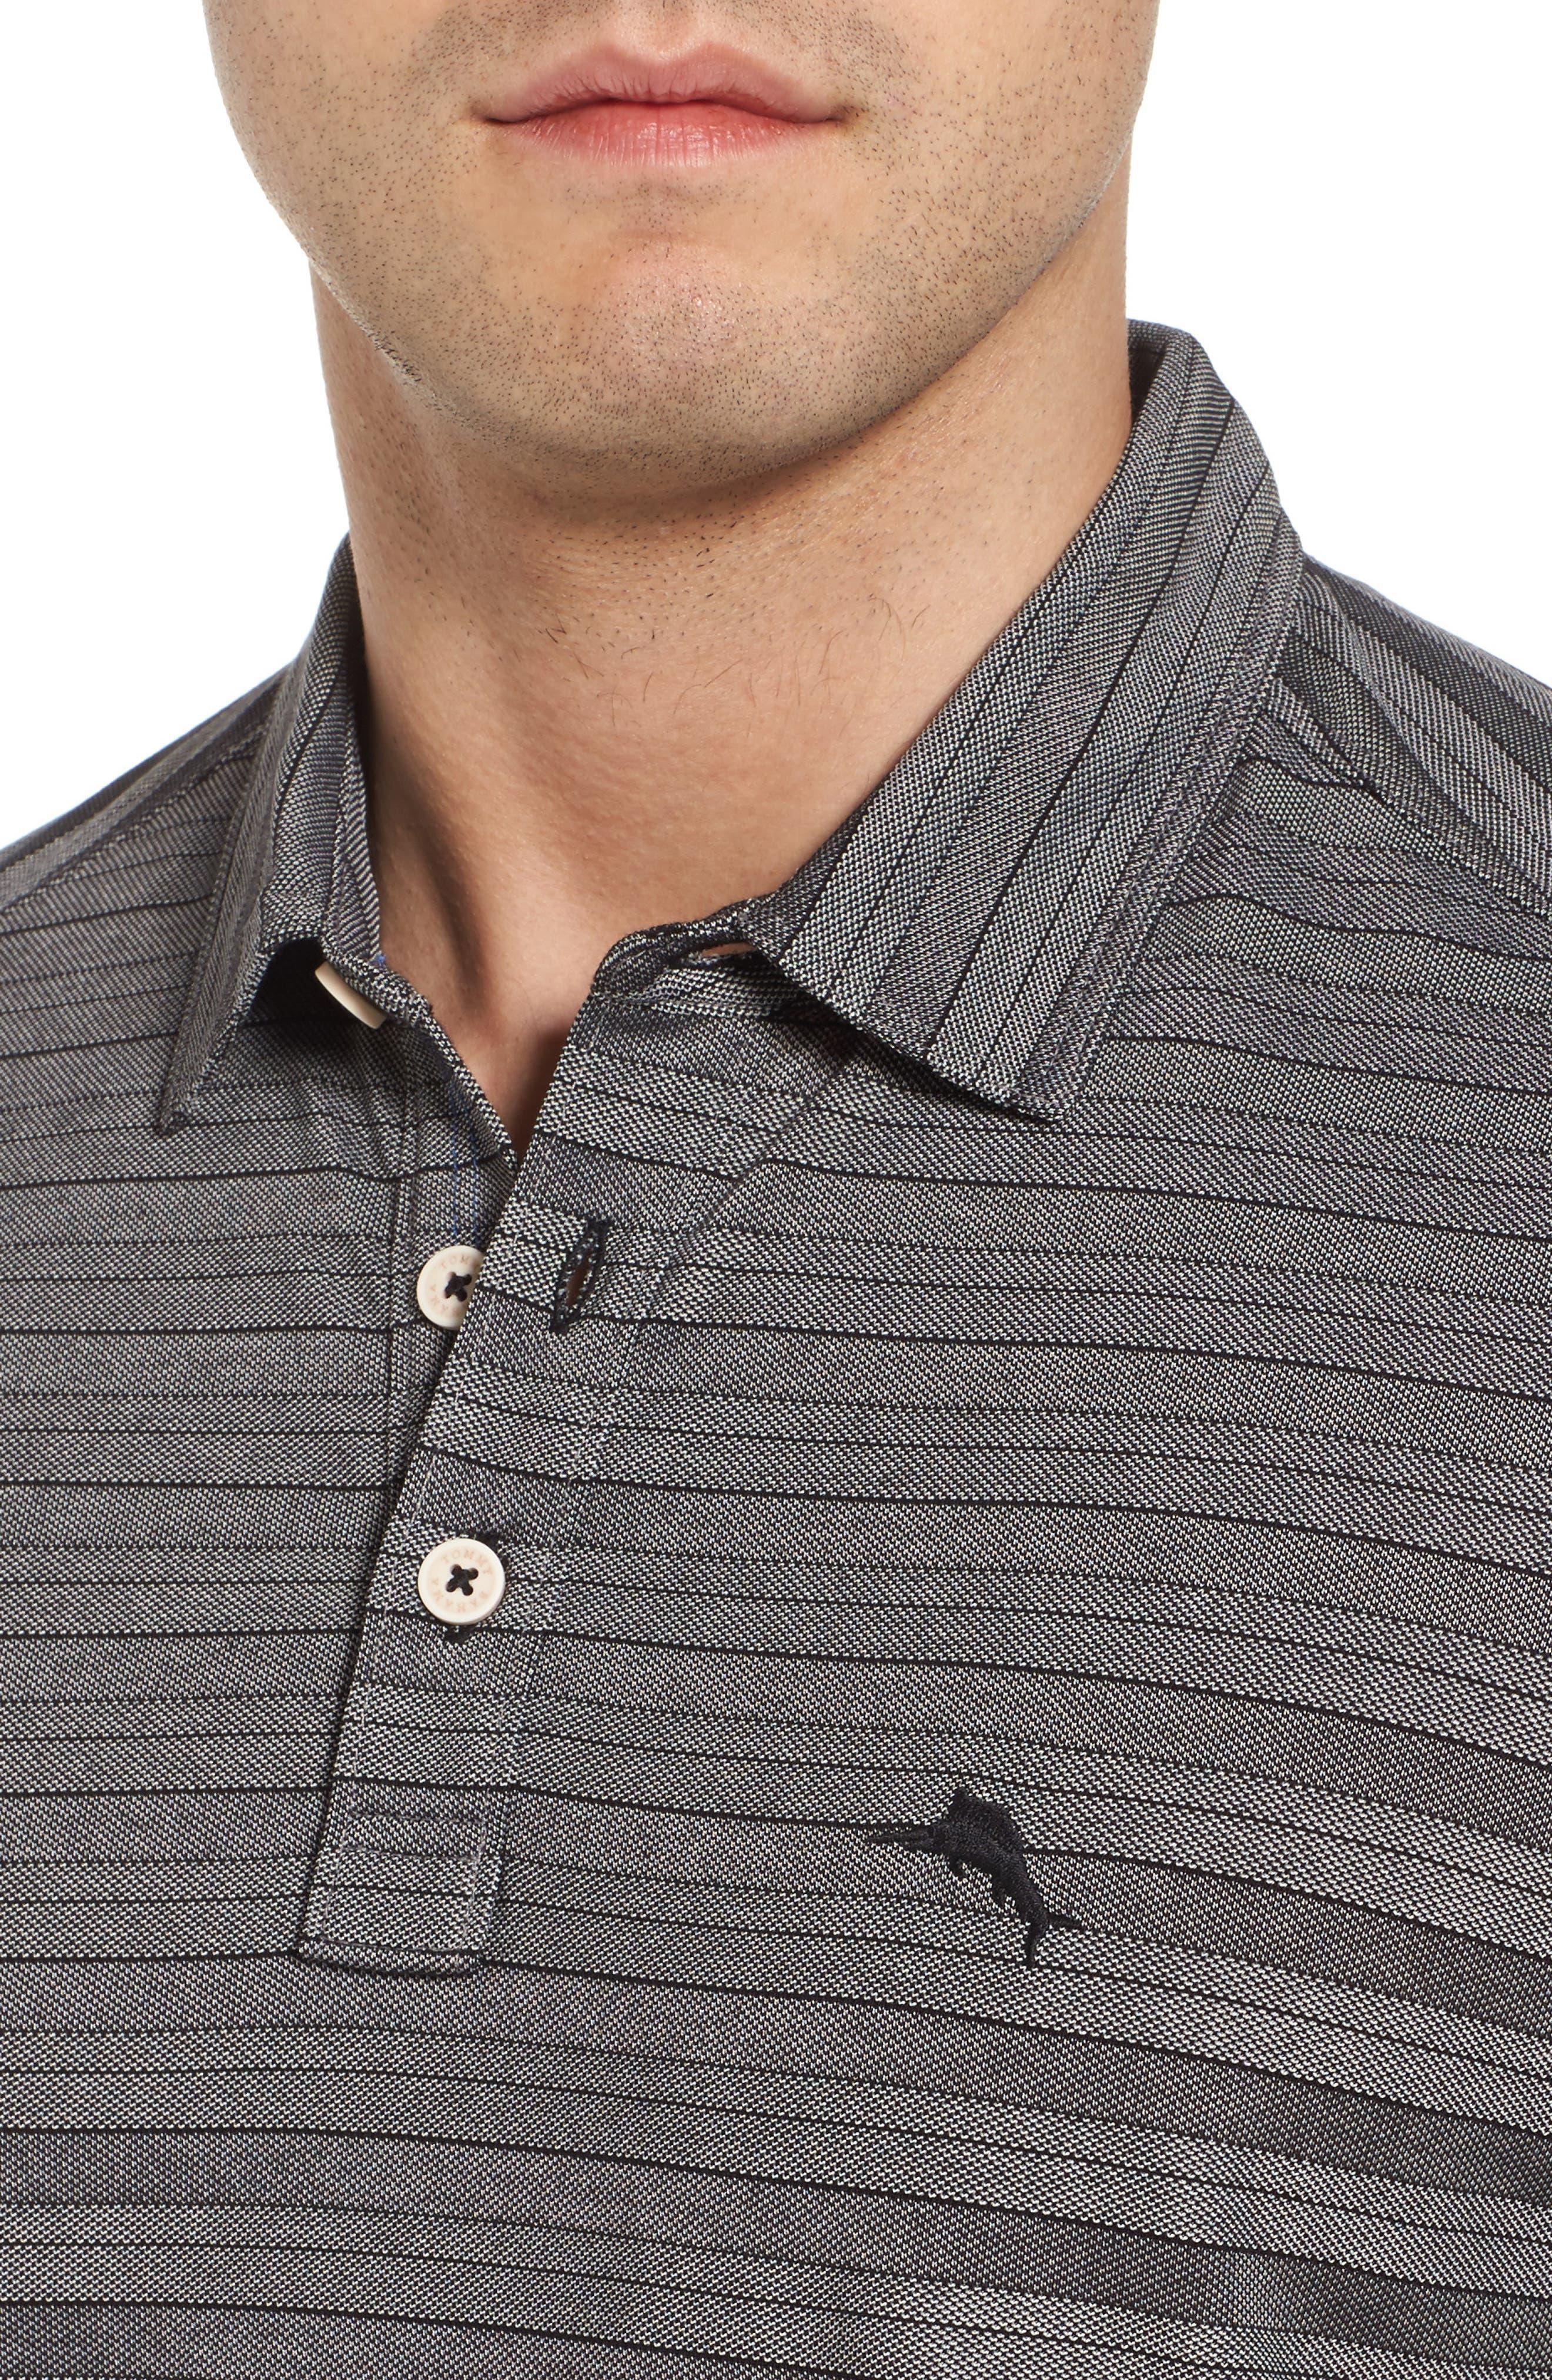 Tropicool Tides Stripe Polo,                             Alternate thumbnail 4, color,                             Black